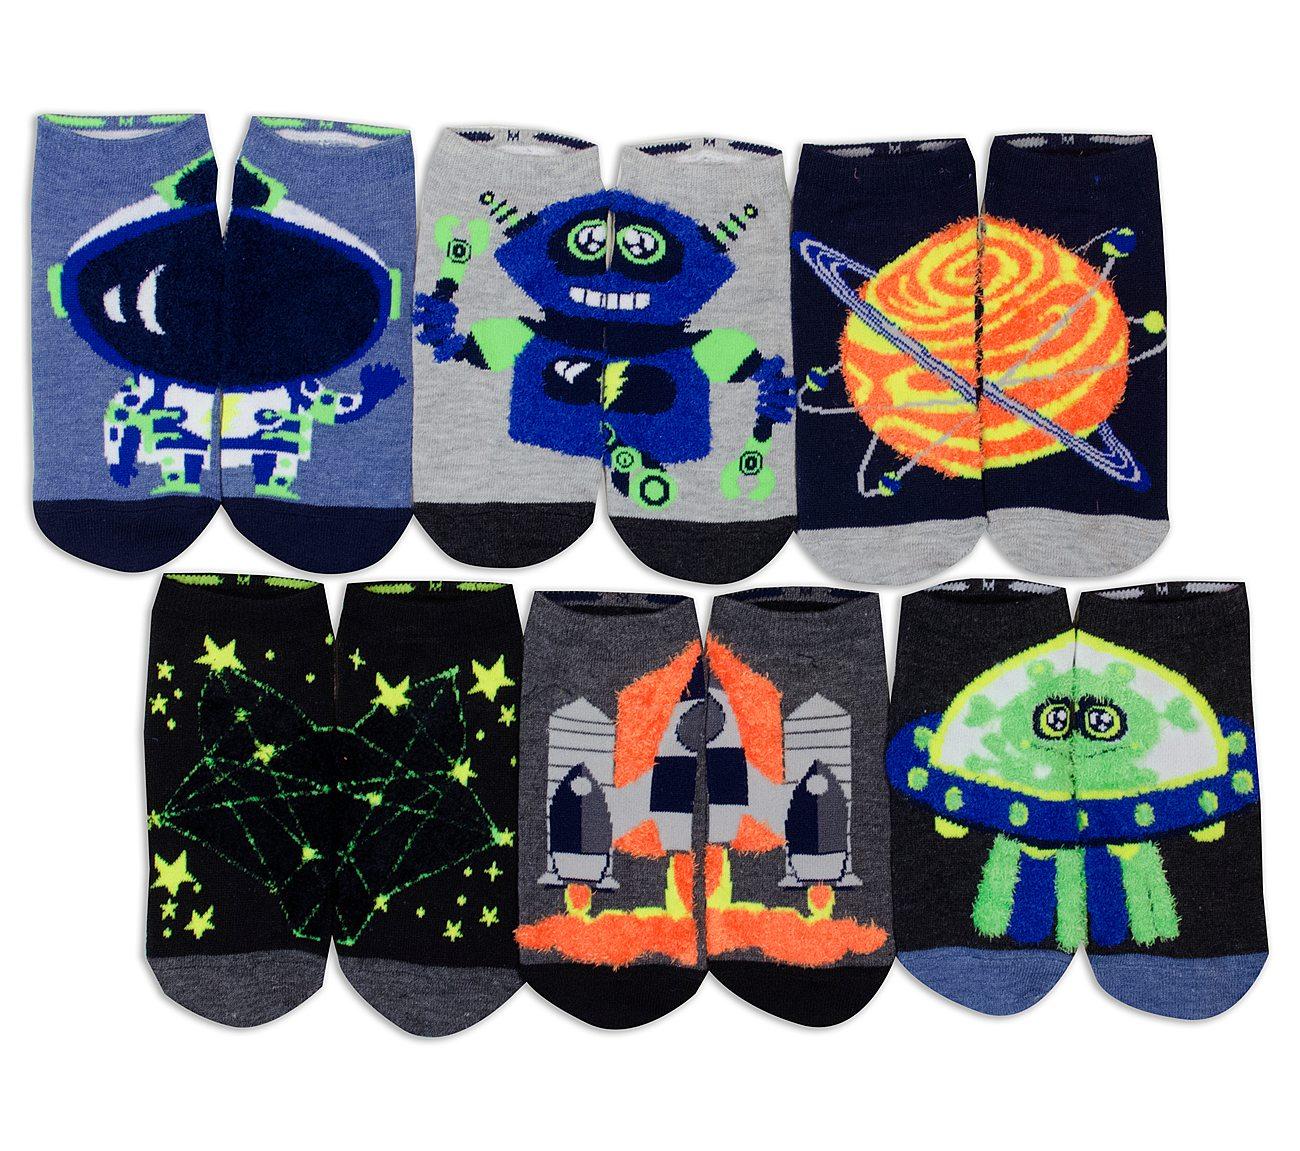 6 Pack Sci Fi Low Cut Socks